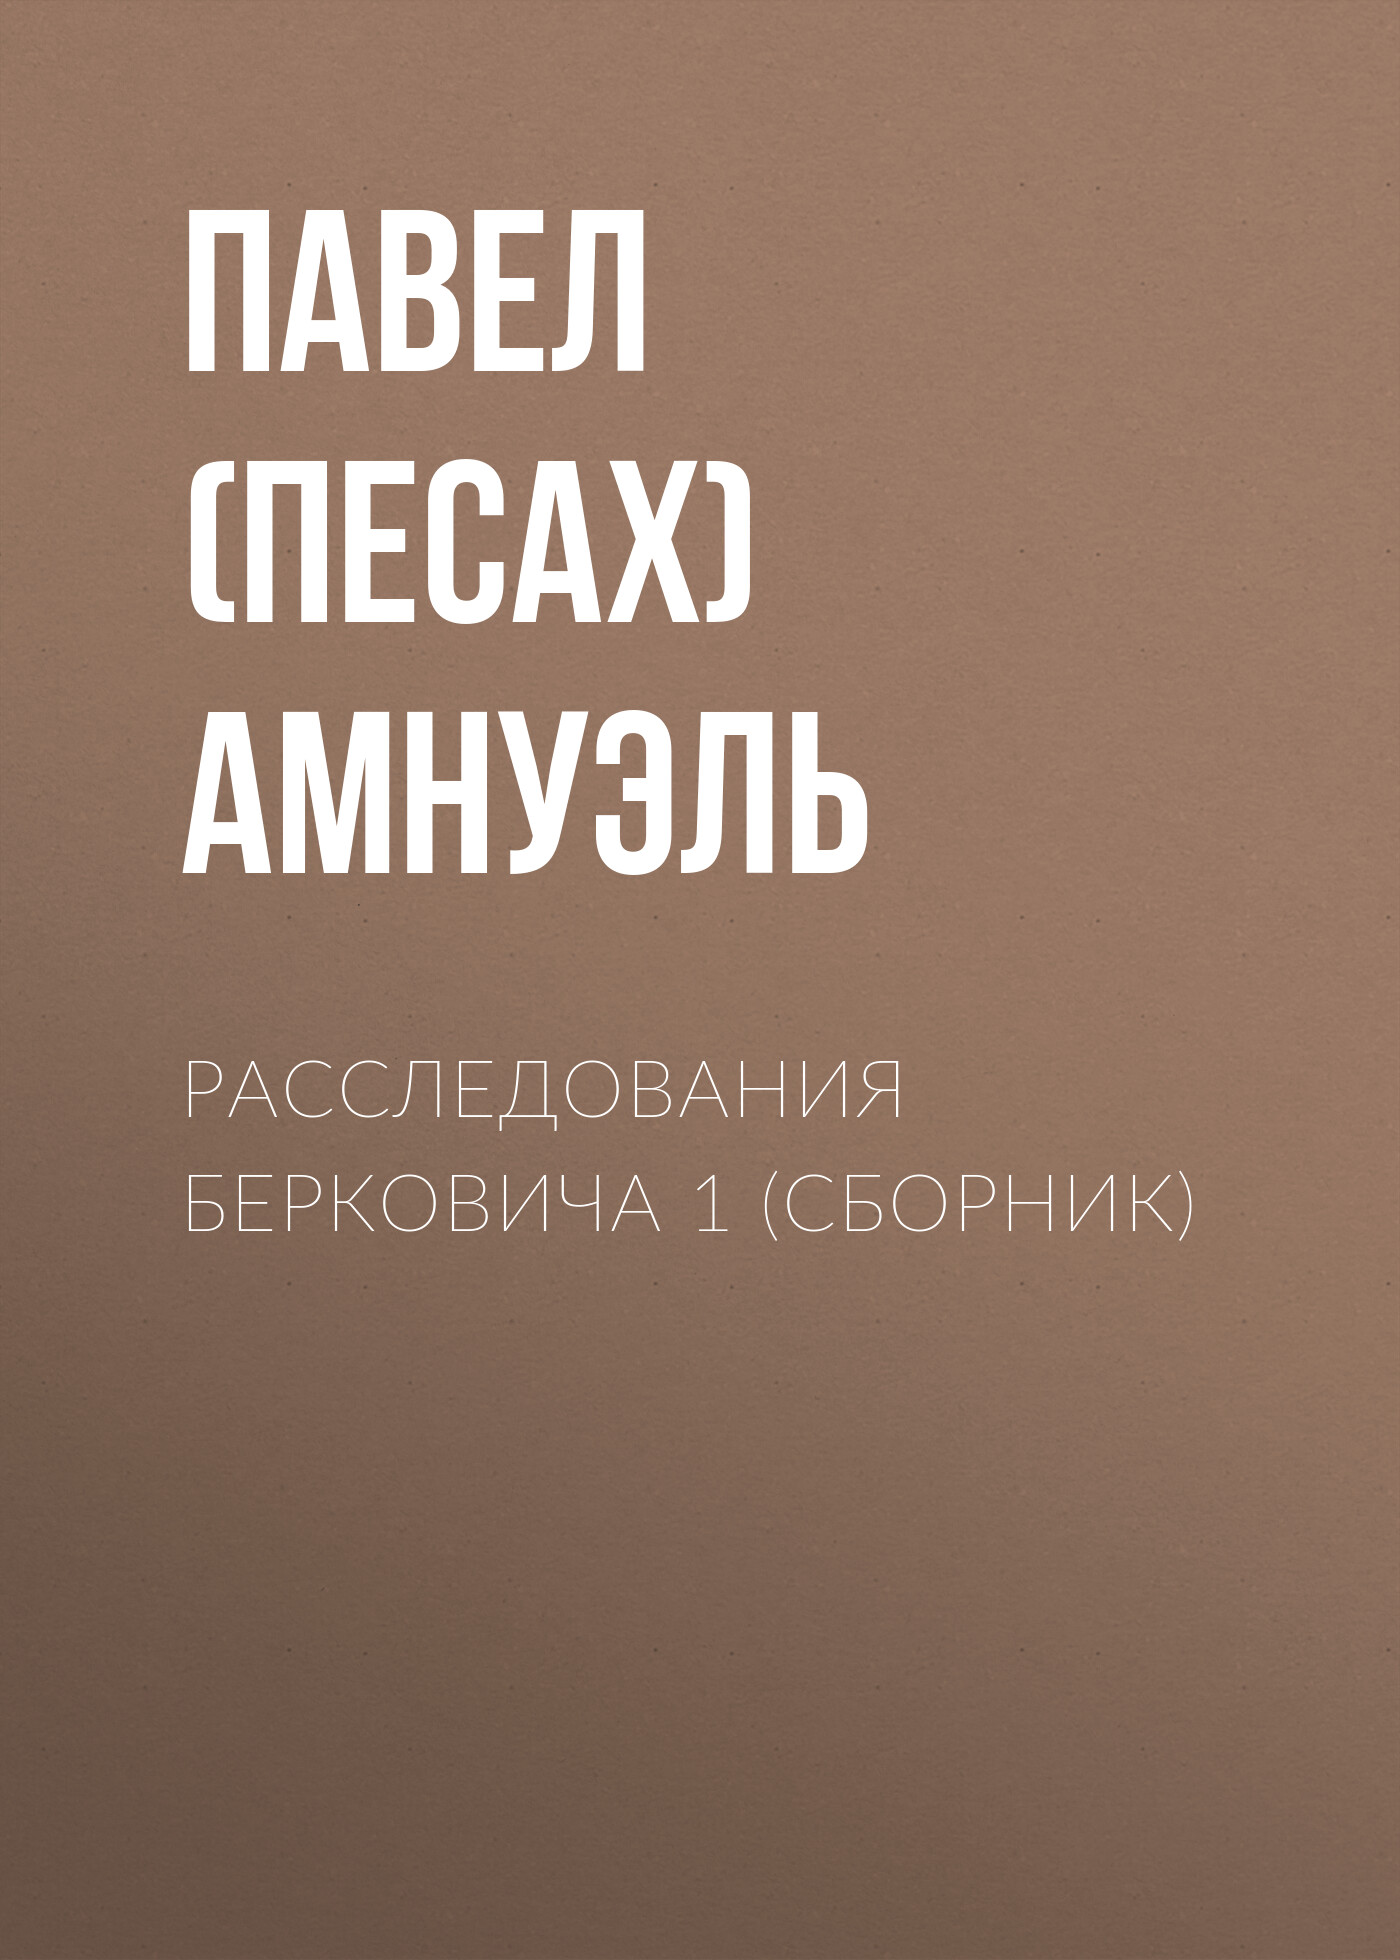 Павел (Песах) Амнуэль Расследования Берковича 1 (сборник) цены онлайн